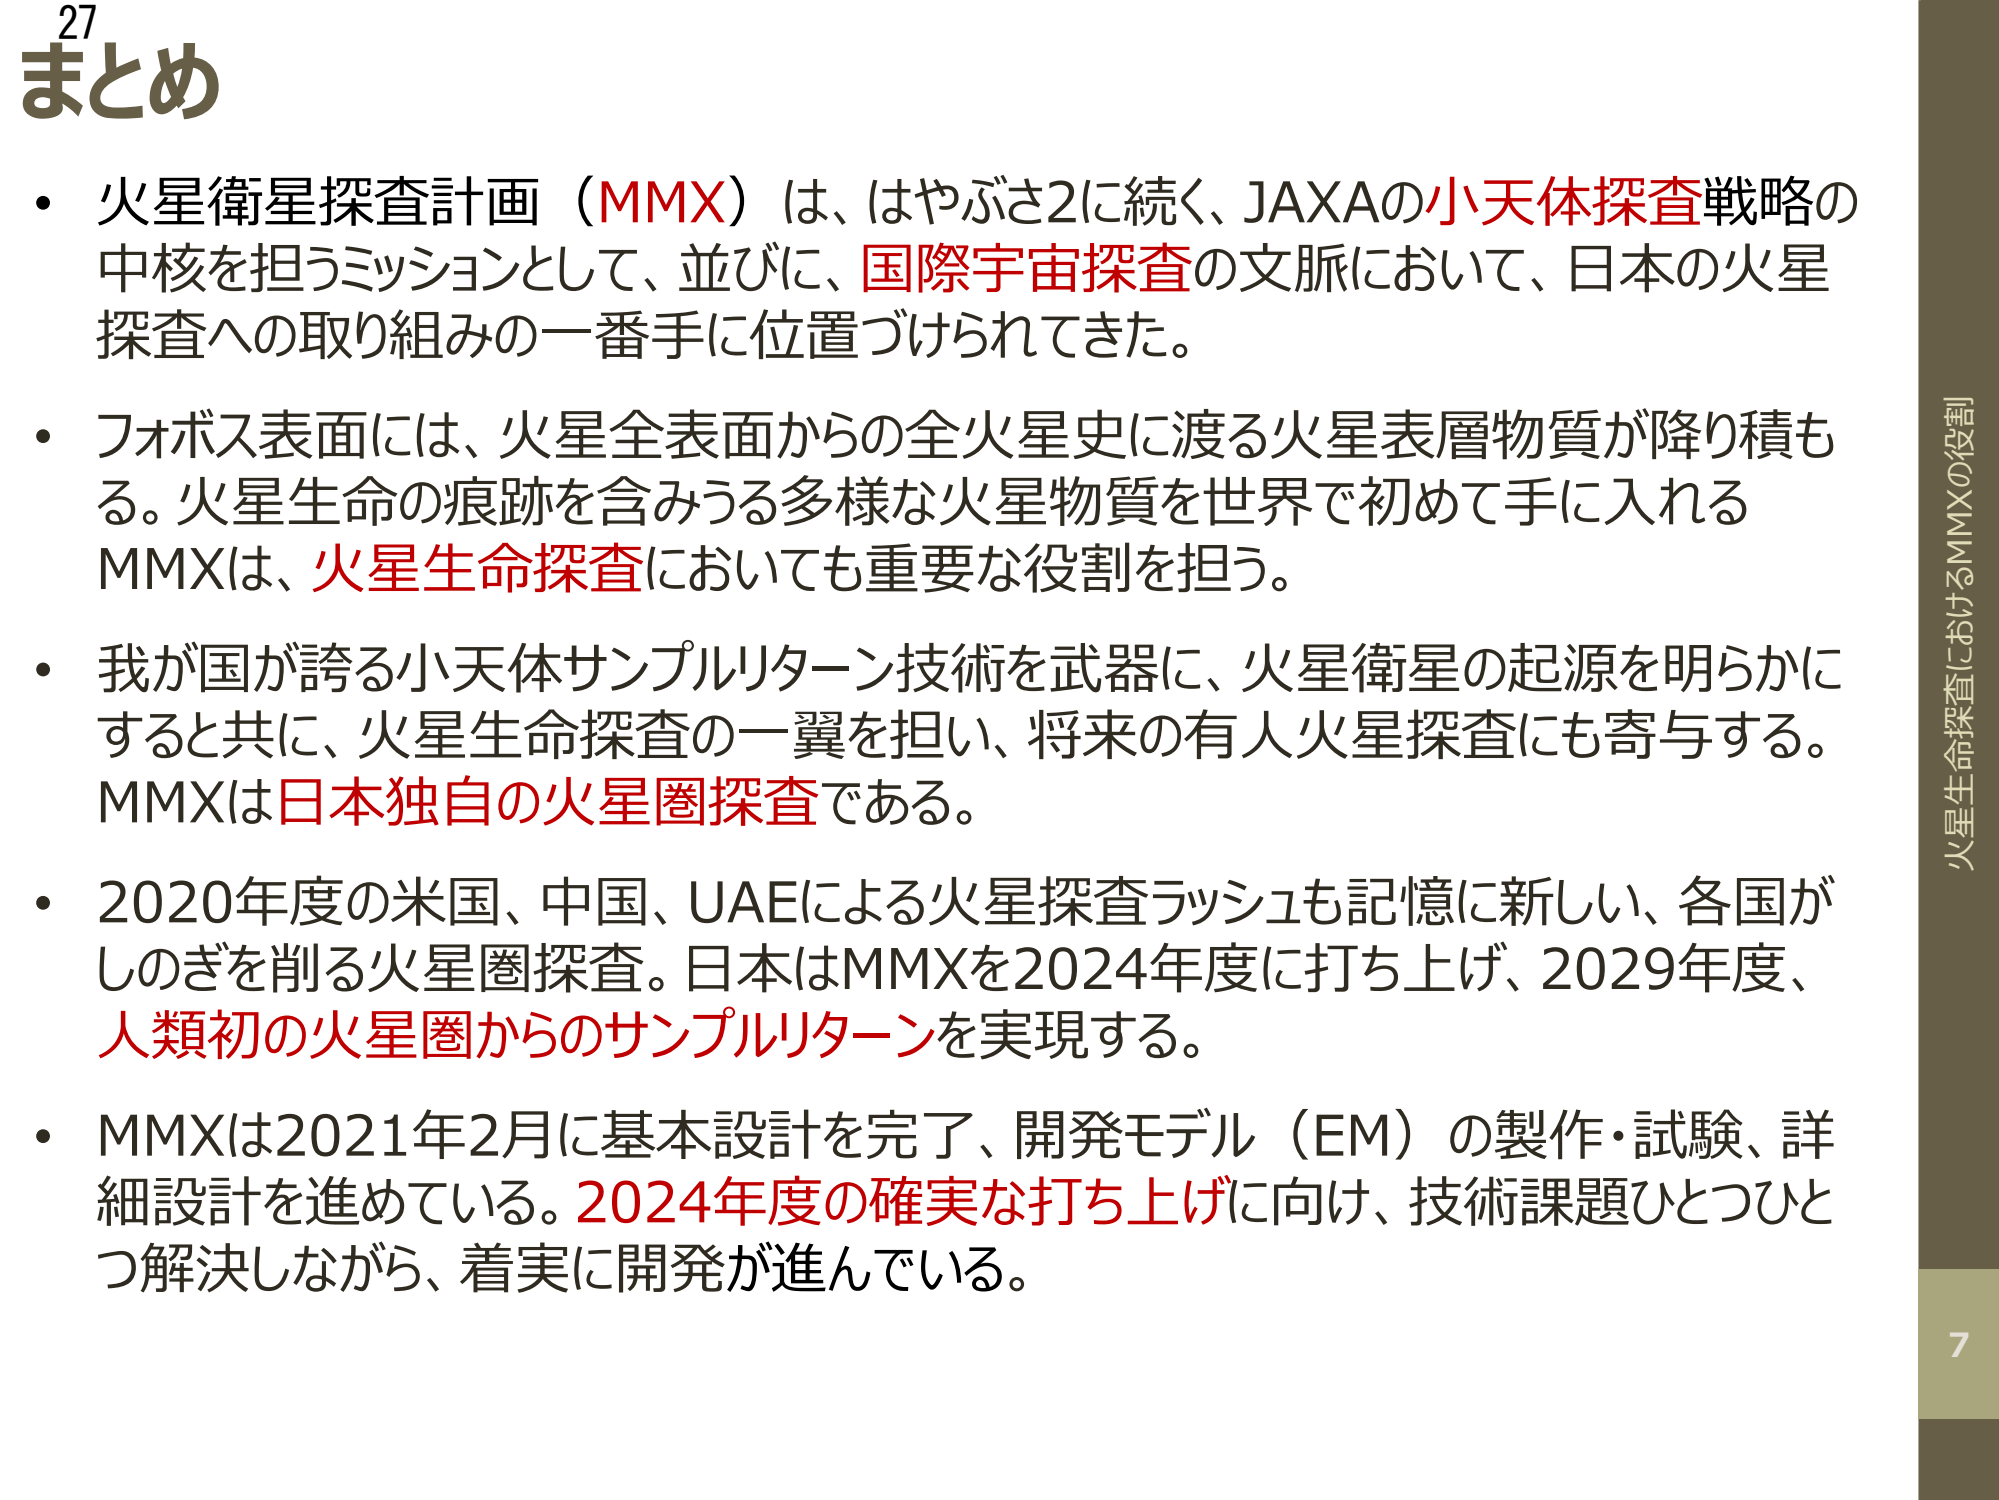 f:id:Imamura:20210819095732p:plain